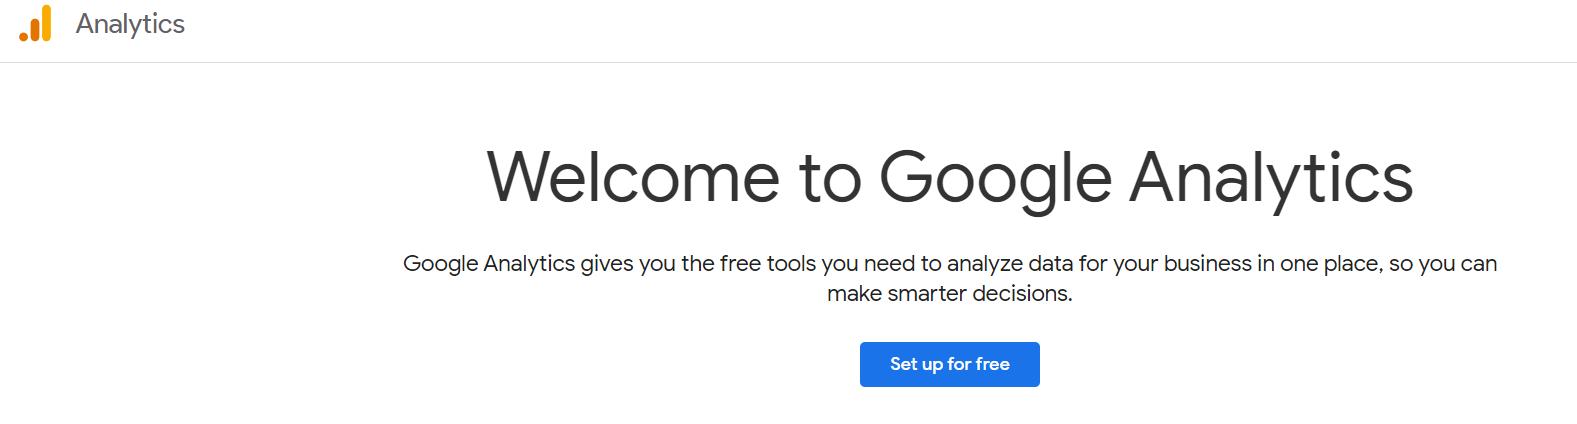 A screenshot of Google Analytics' homepage